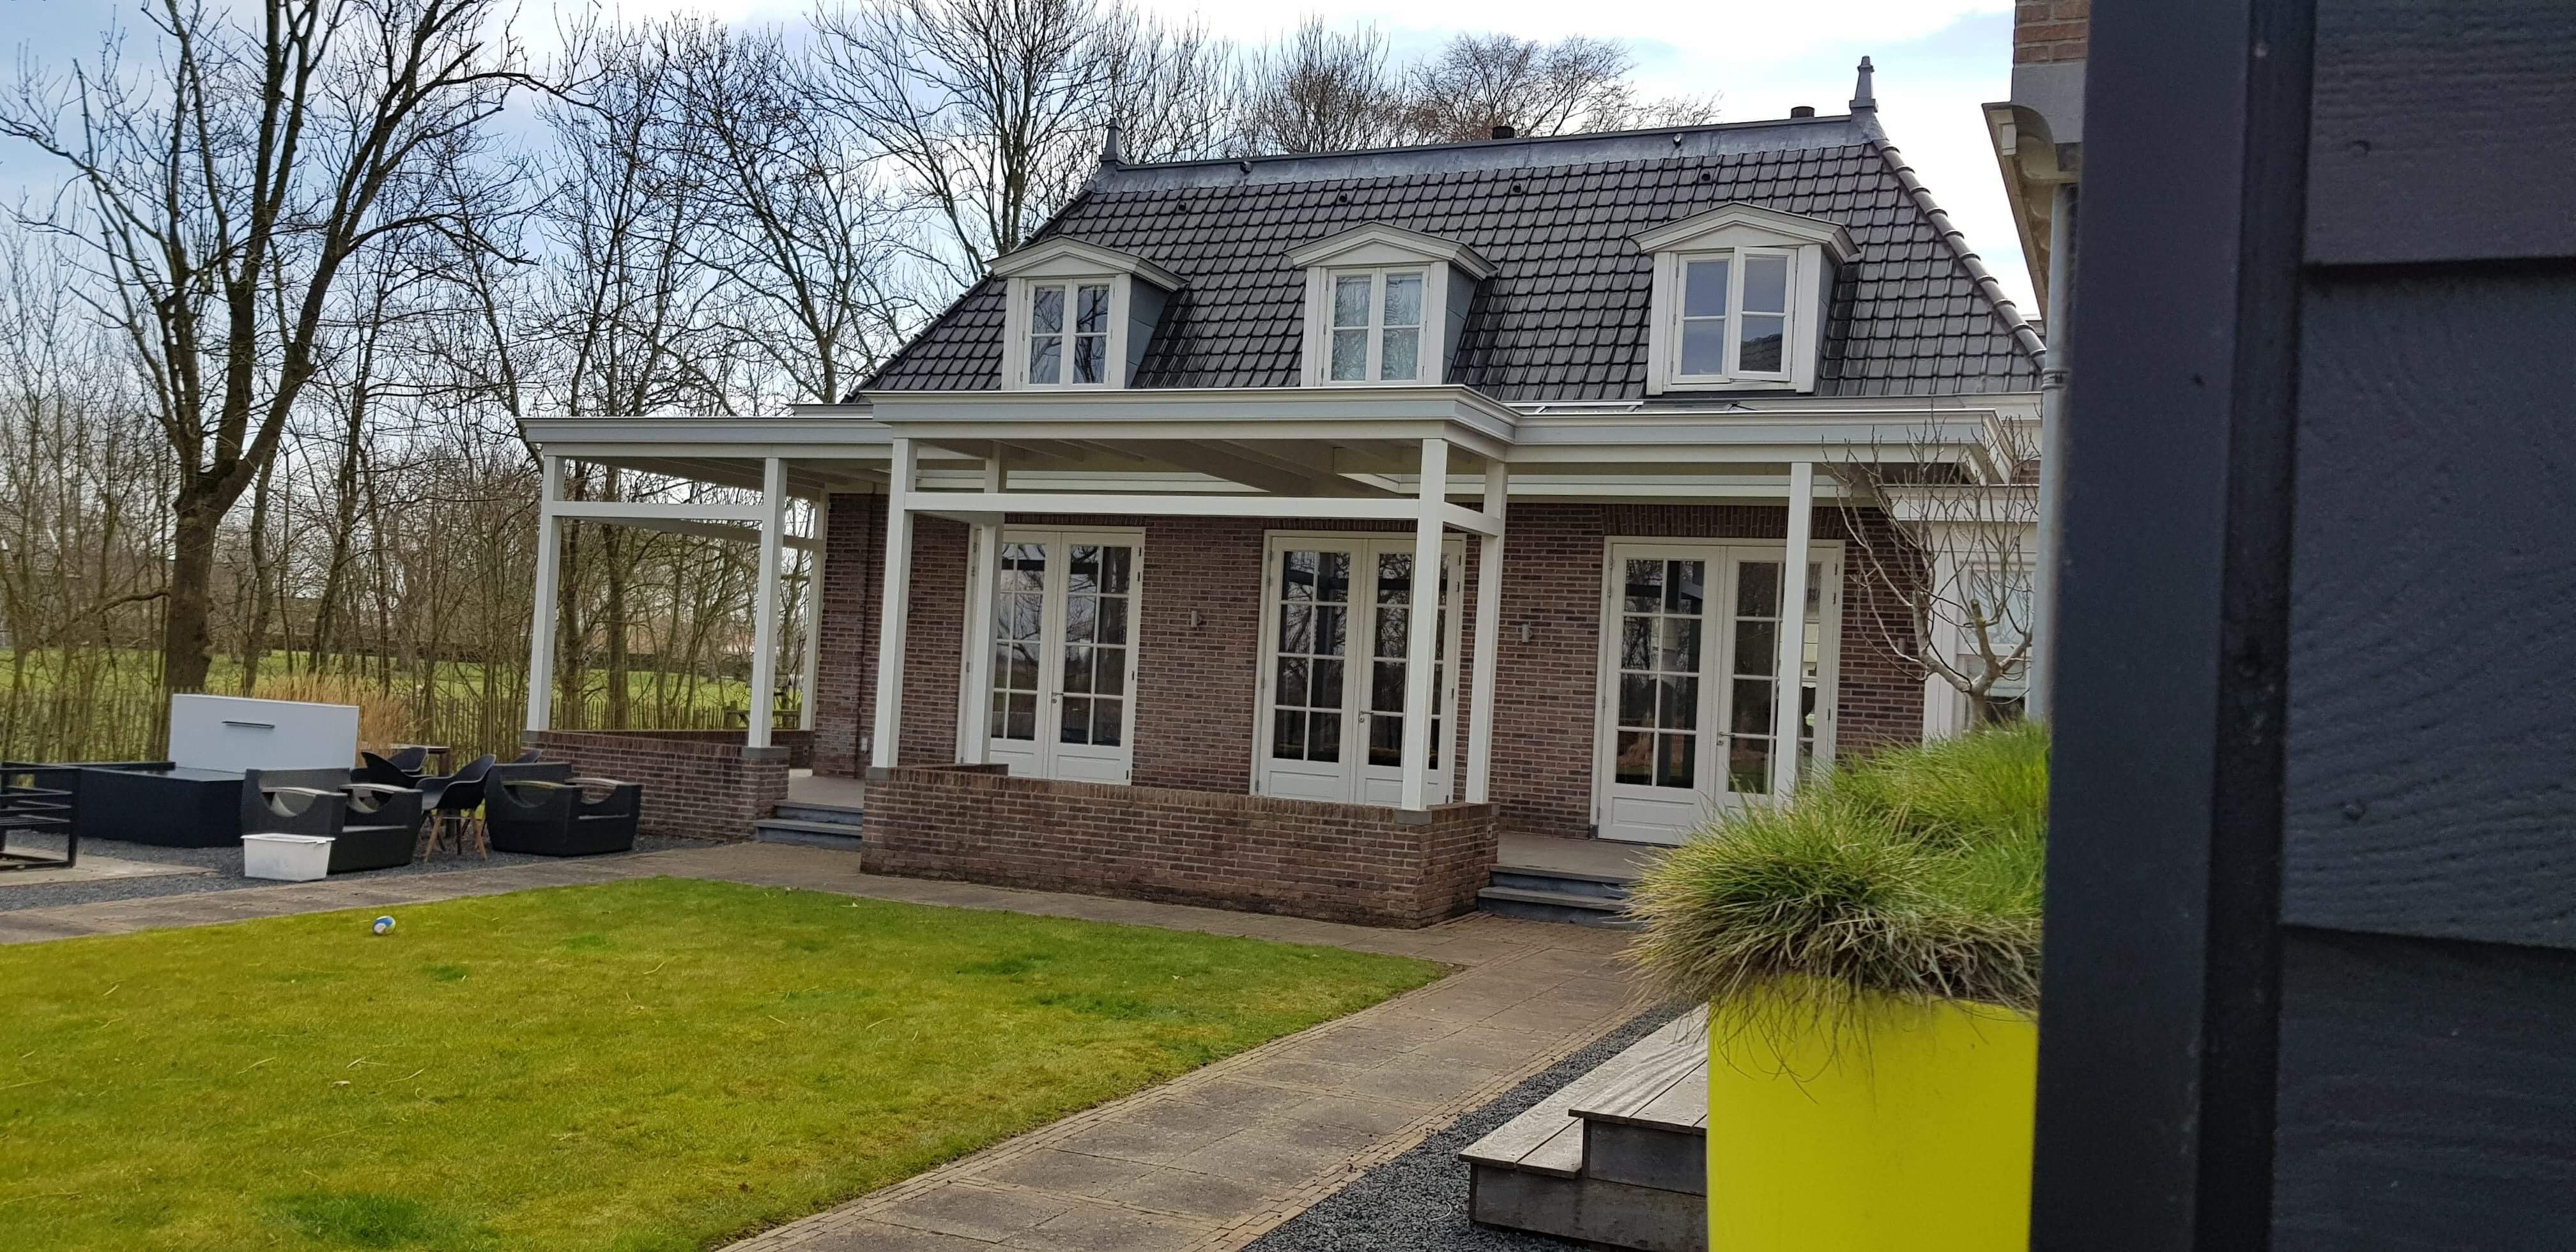 Royale statige houten veranda